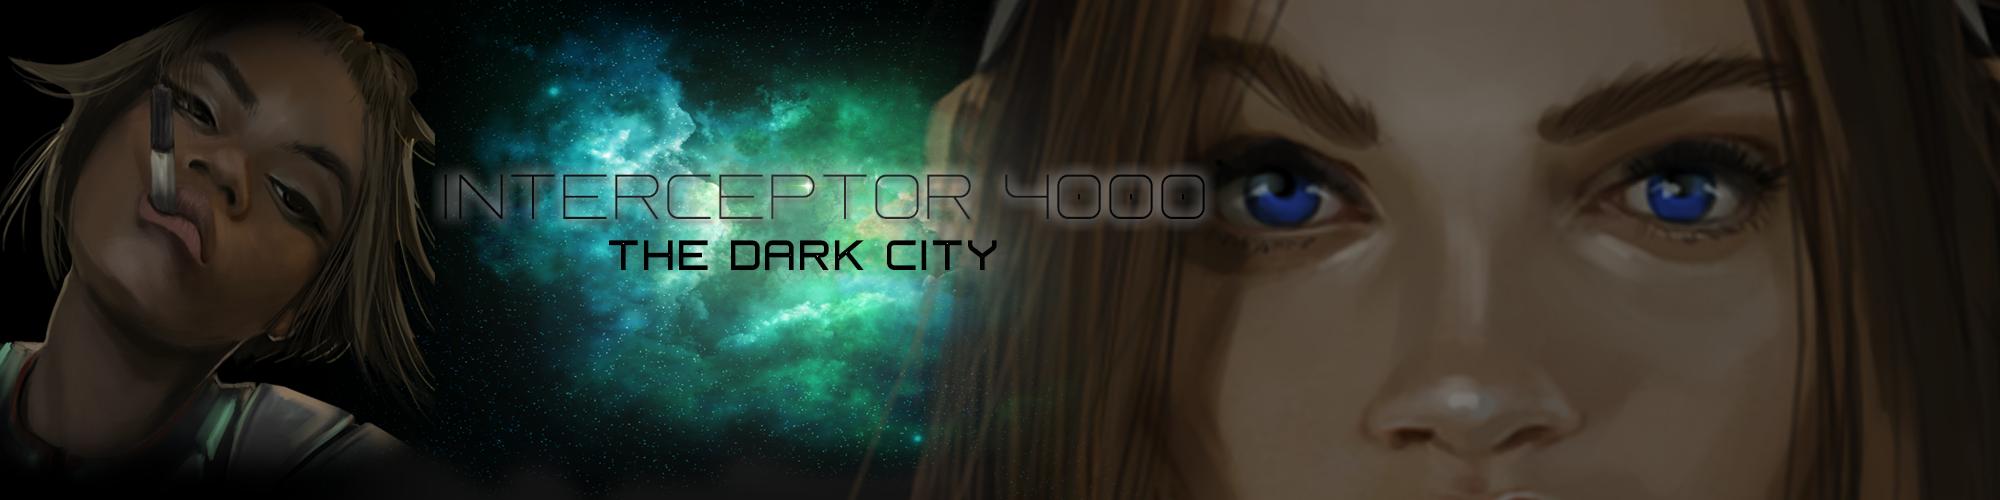 INTERCEPTOR 4000